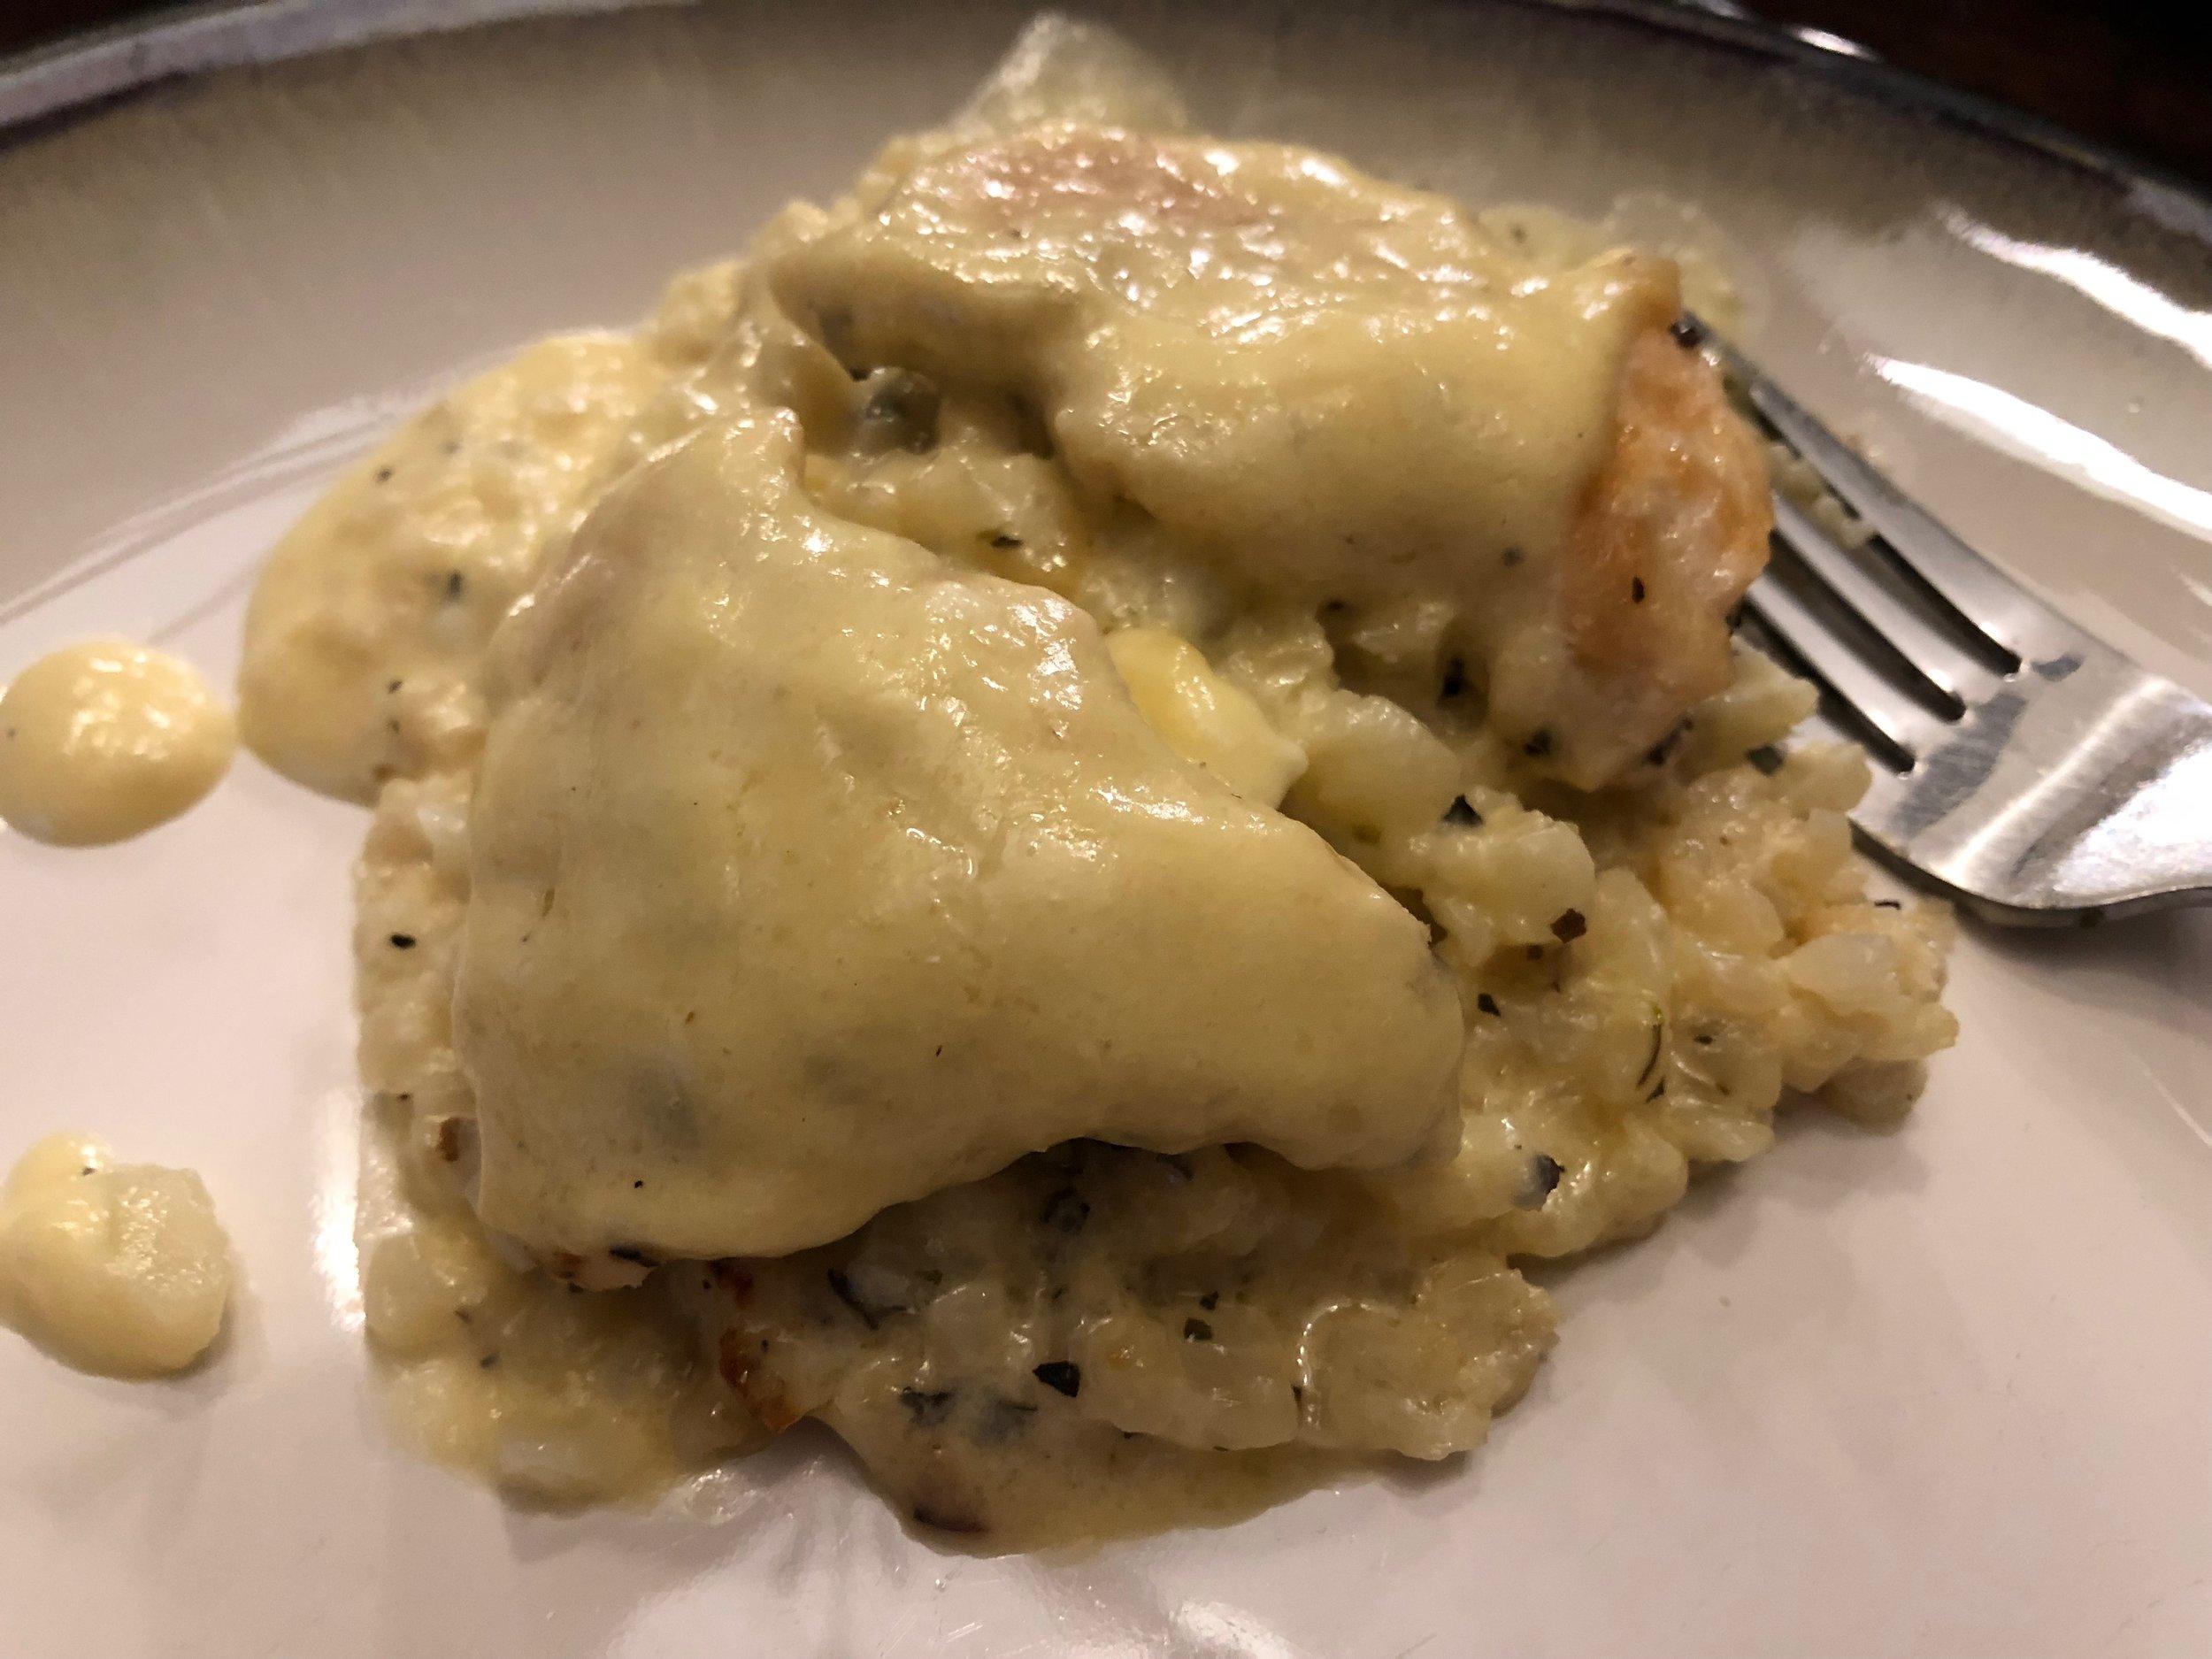 Keto and low carb chicken alfredo casserole dinner recipe